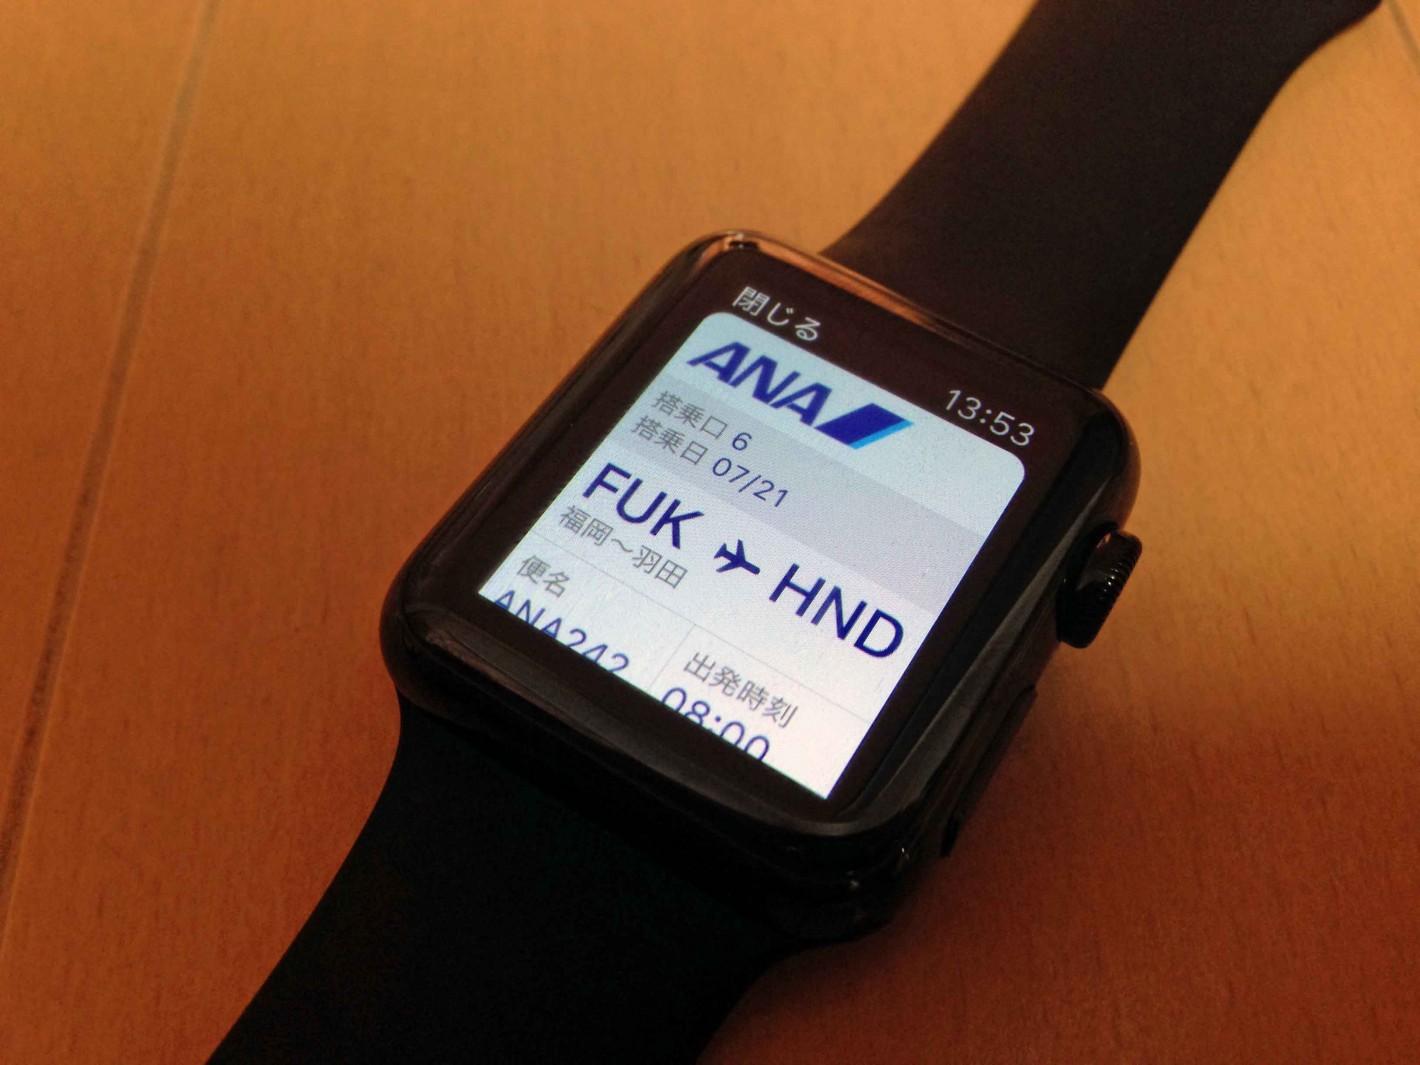 iPhoneのPassbookに登録すればApple Watchにも航空券が登録される。